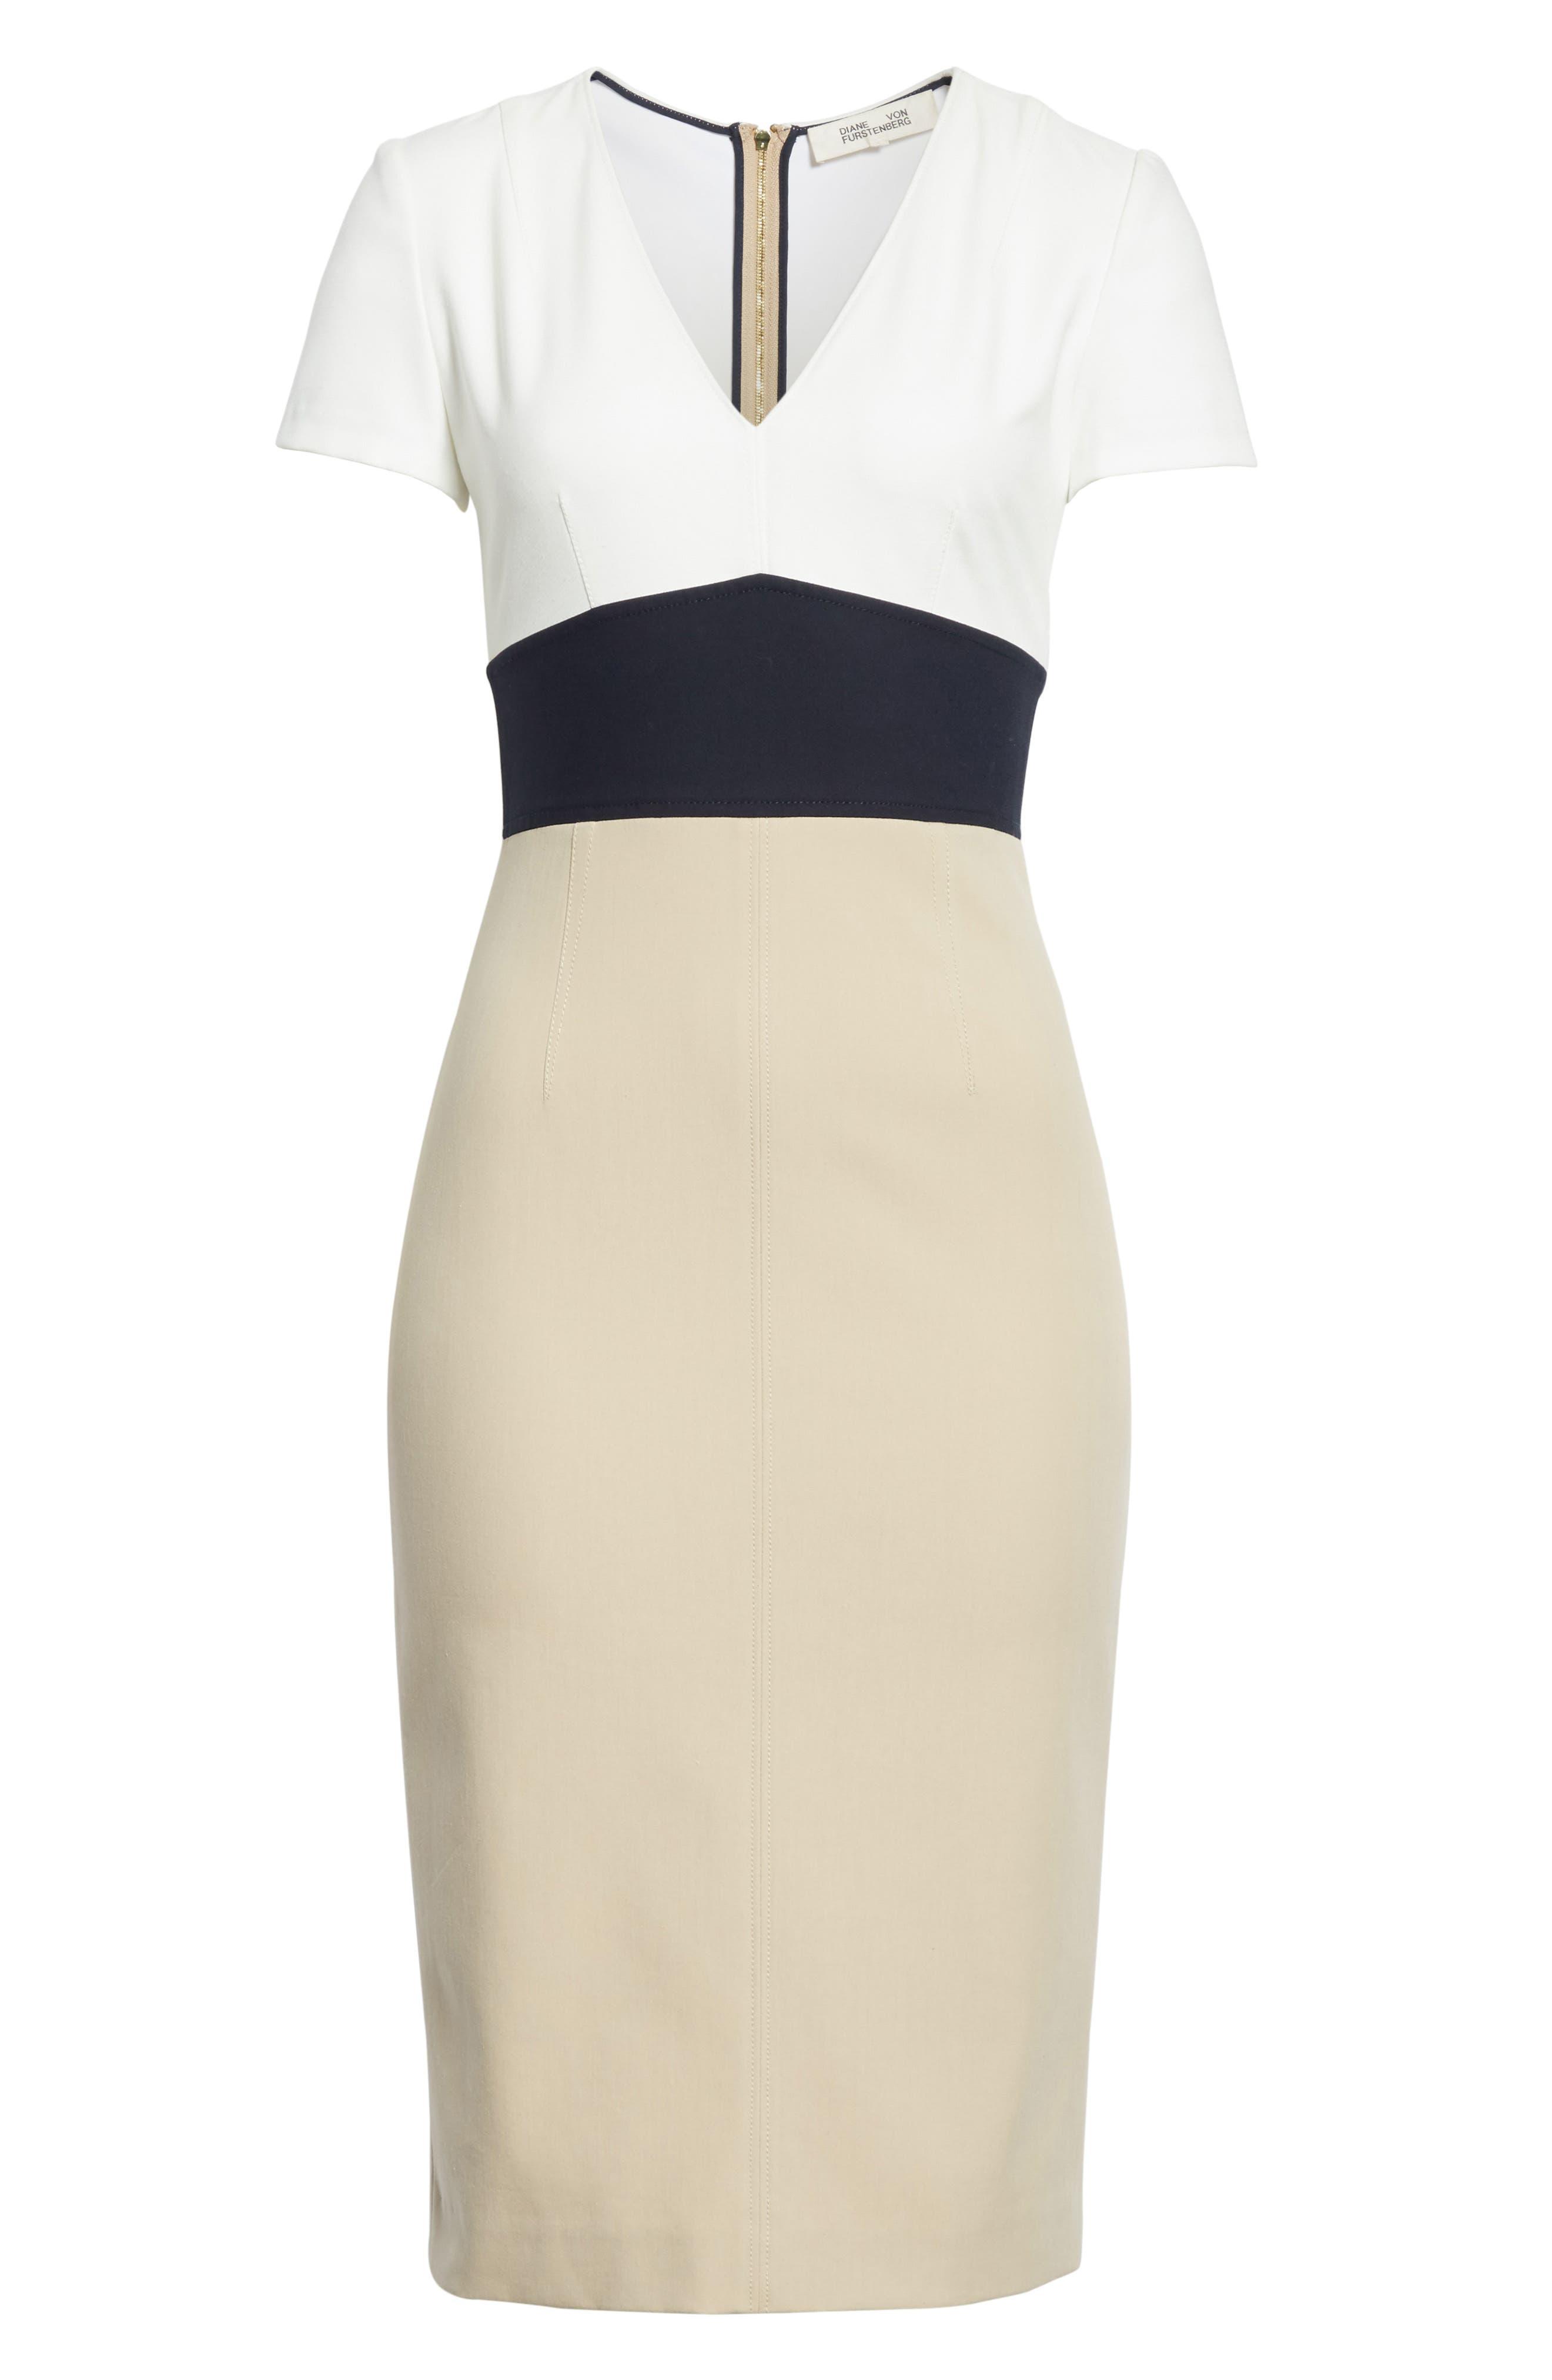 Diane von Furstenberg Colorblock Stretch Cotton Blend Sheath Dress,                             Alternate thumbnail 6, color,                             Sand/ Alexander Navy/ White